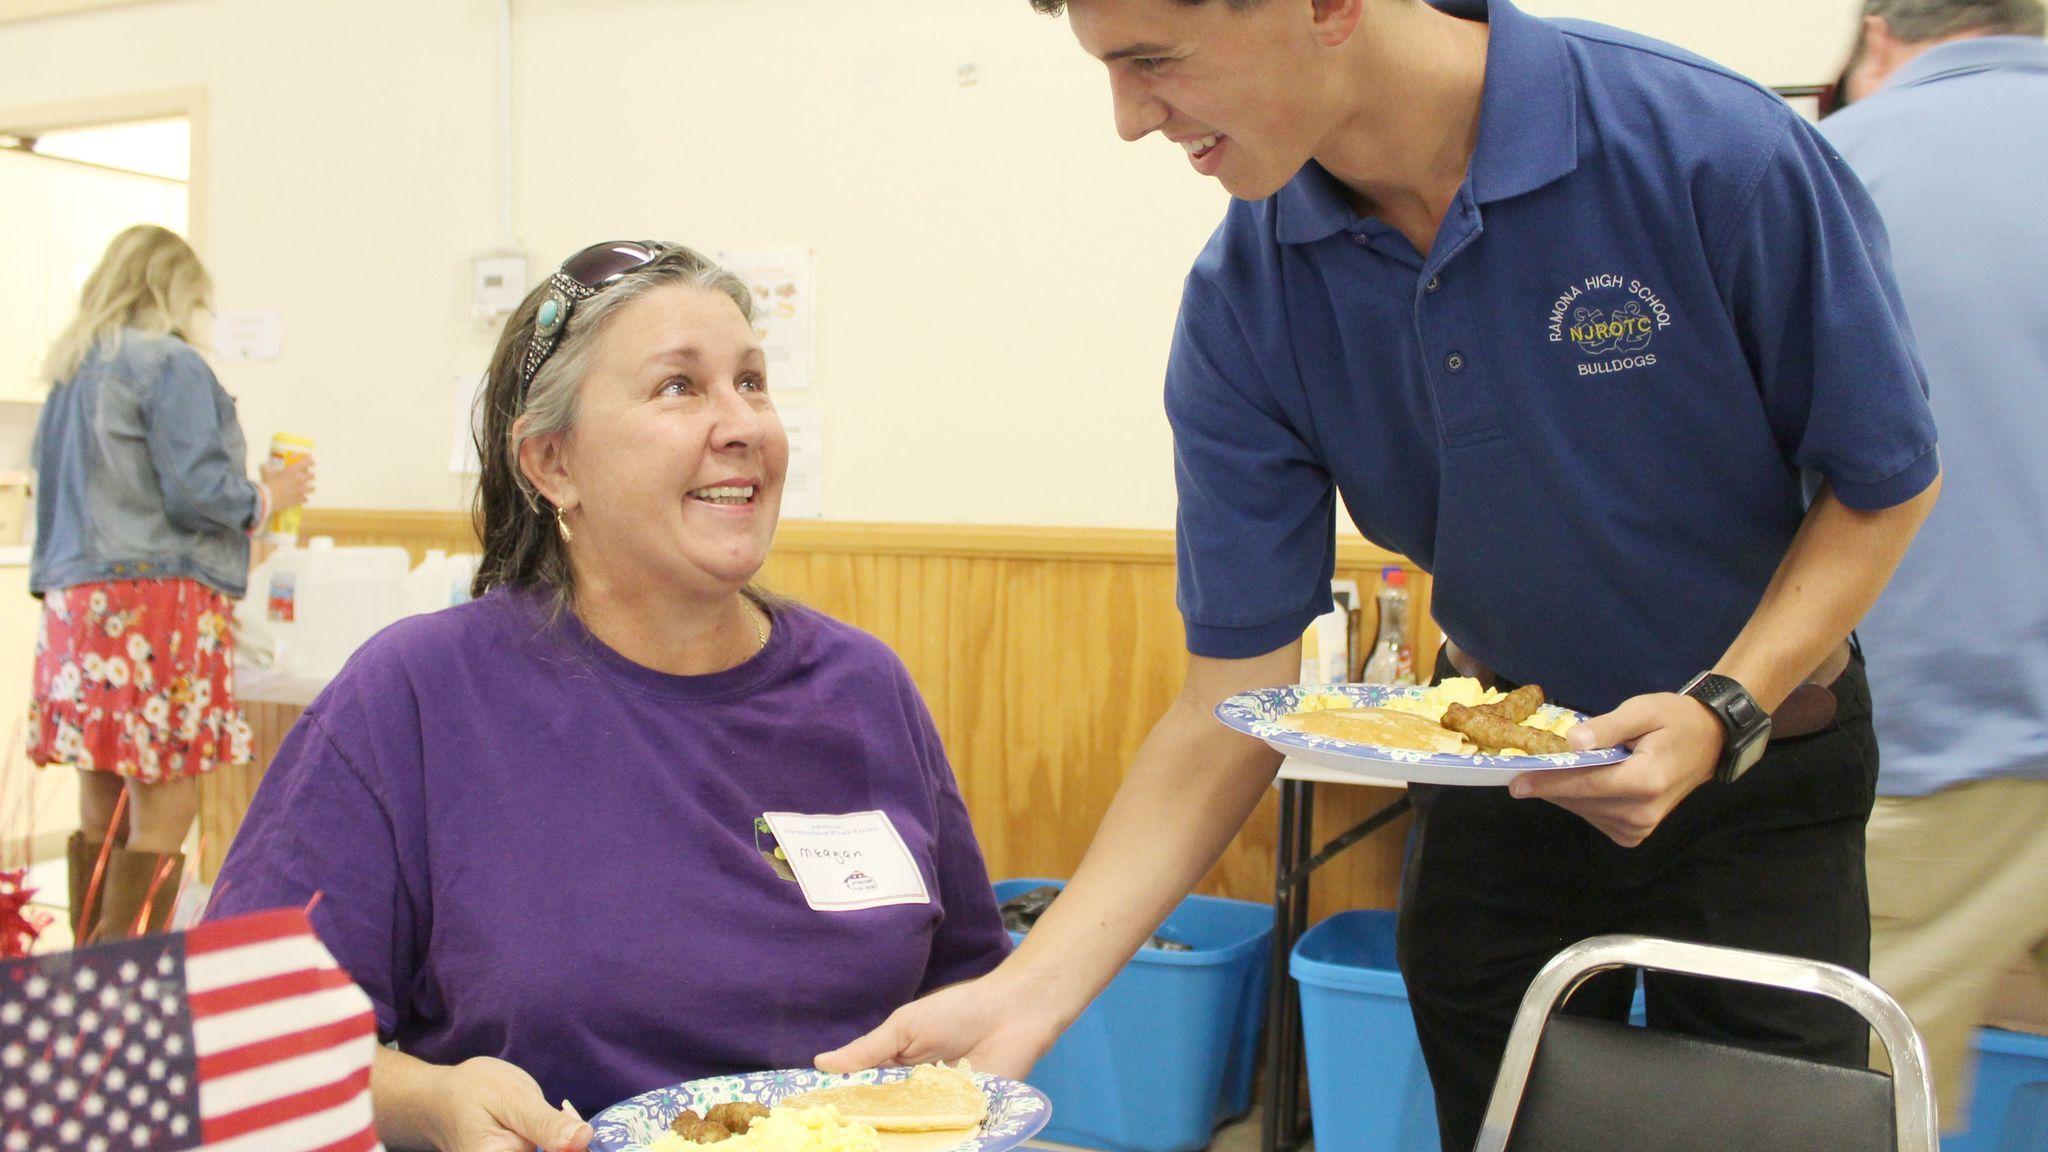 NJROTC Cadet Gavin Roche serves breakfast to Meagen Barrett and others at her table. Barrett is a Ramona Senior Center bus driver.